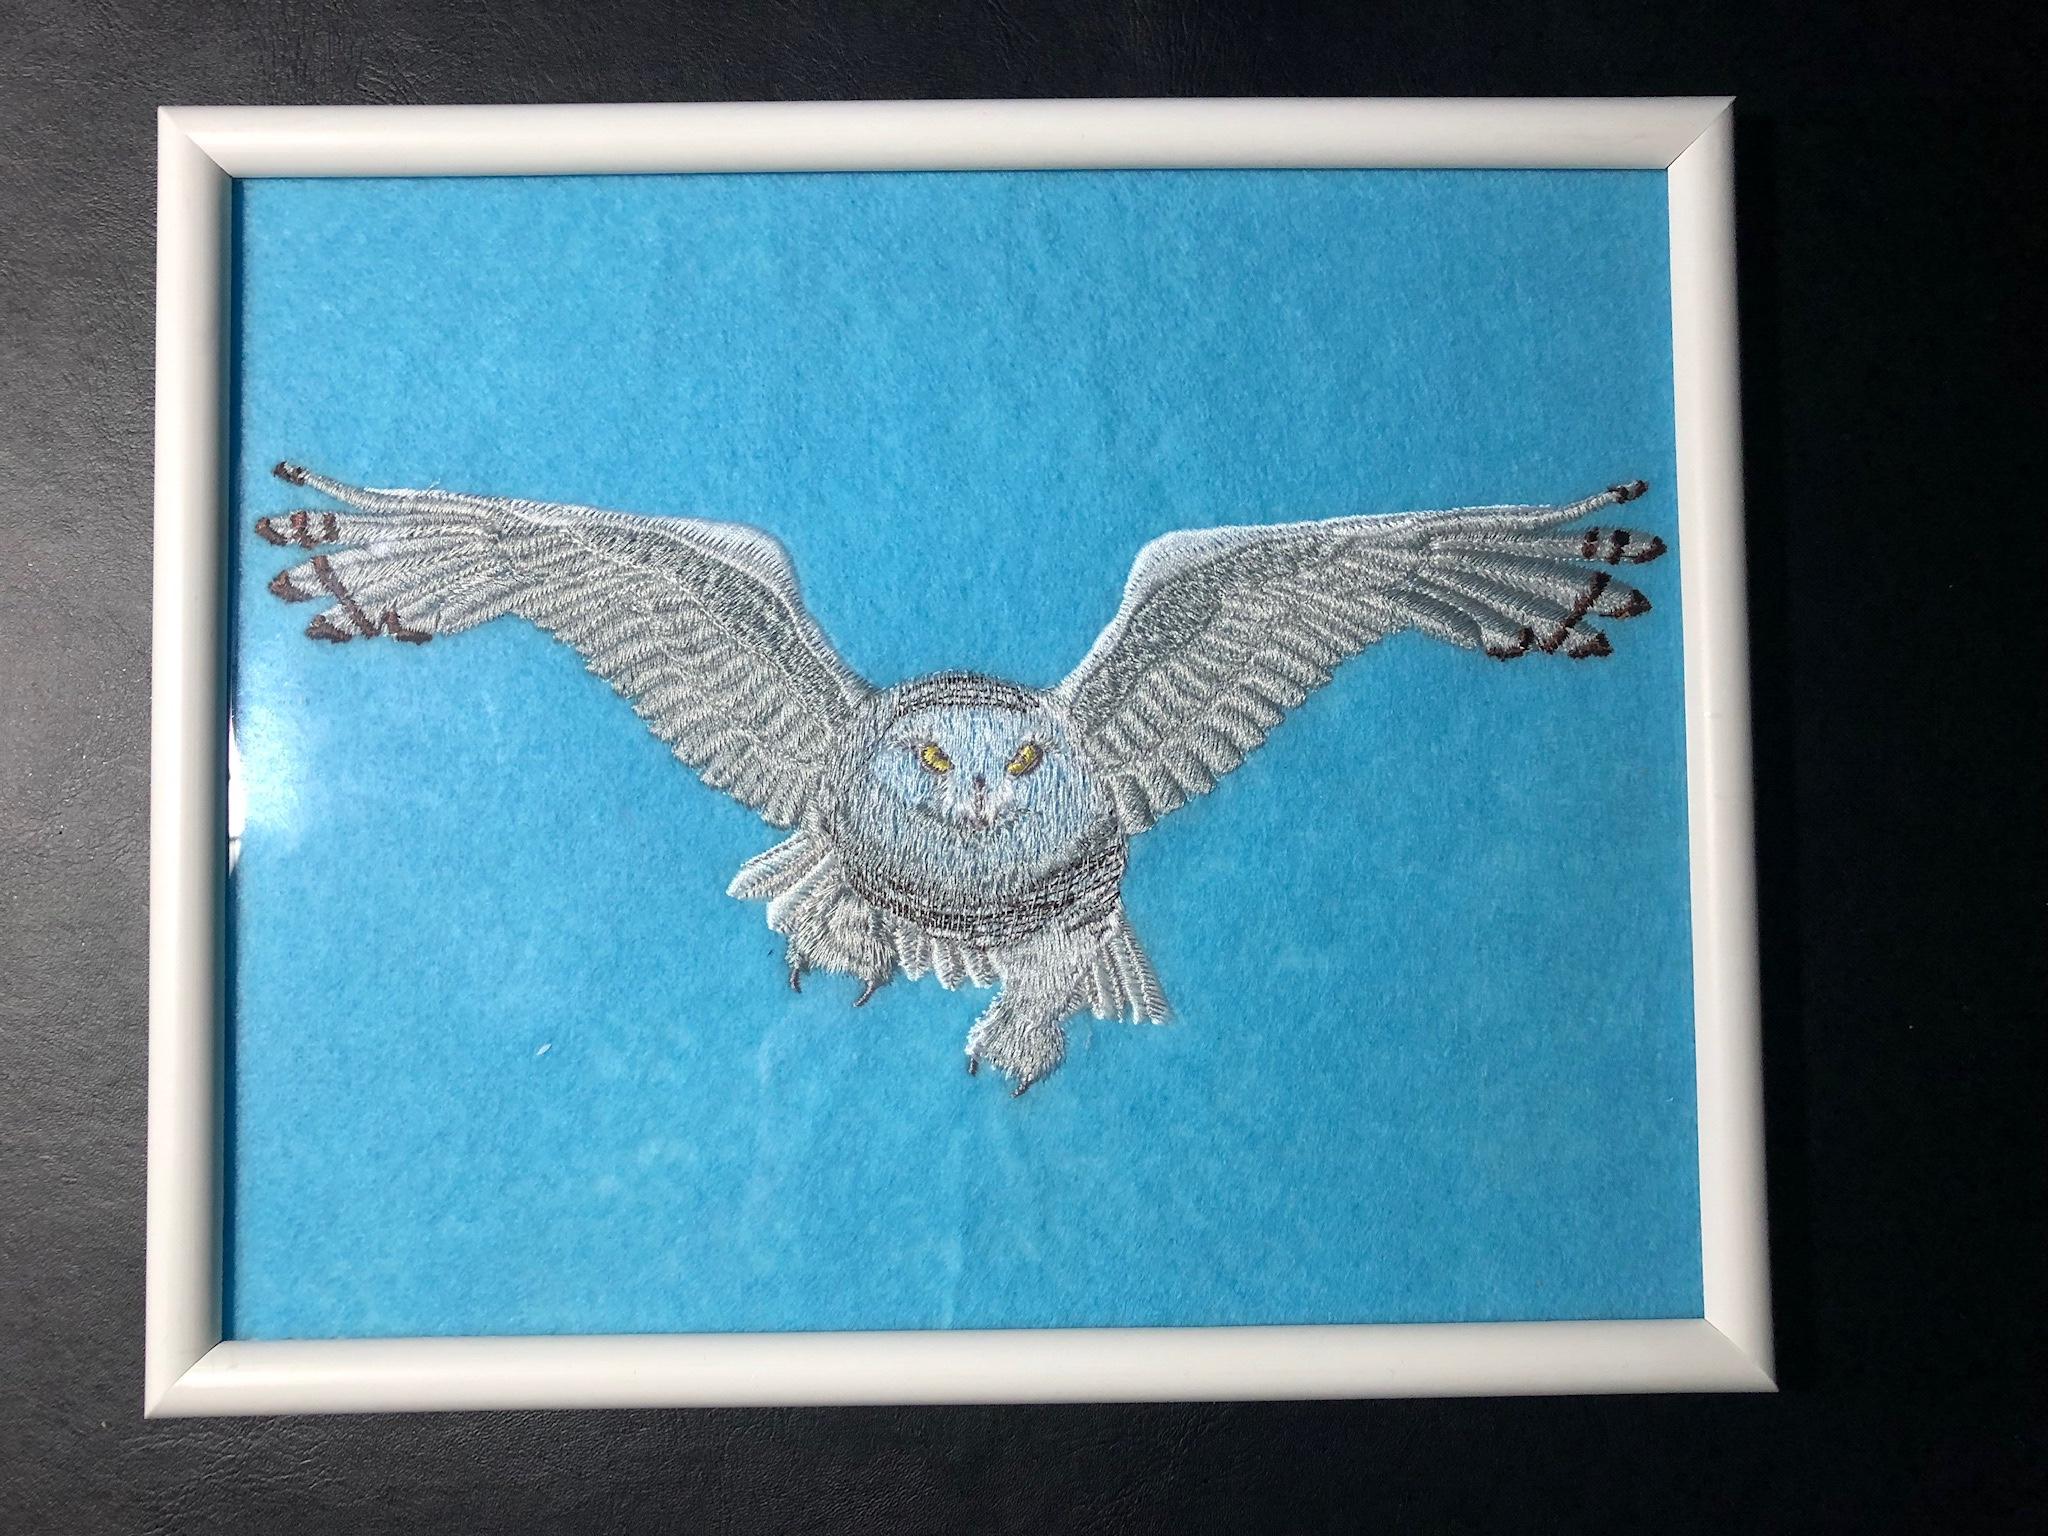 Embroidery/7E1FD8AB-B658-4F41-9158-56189B06F423.jpeg